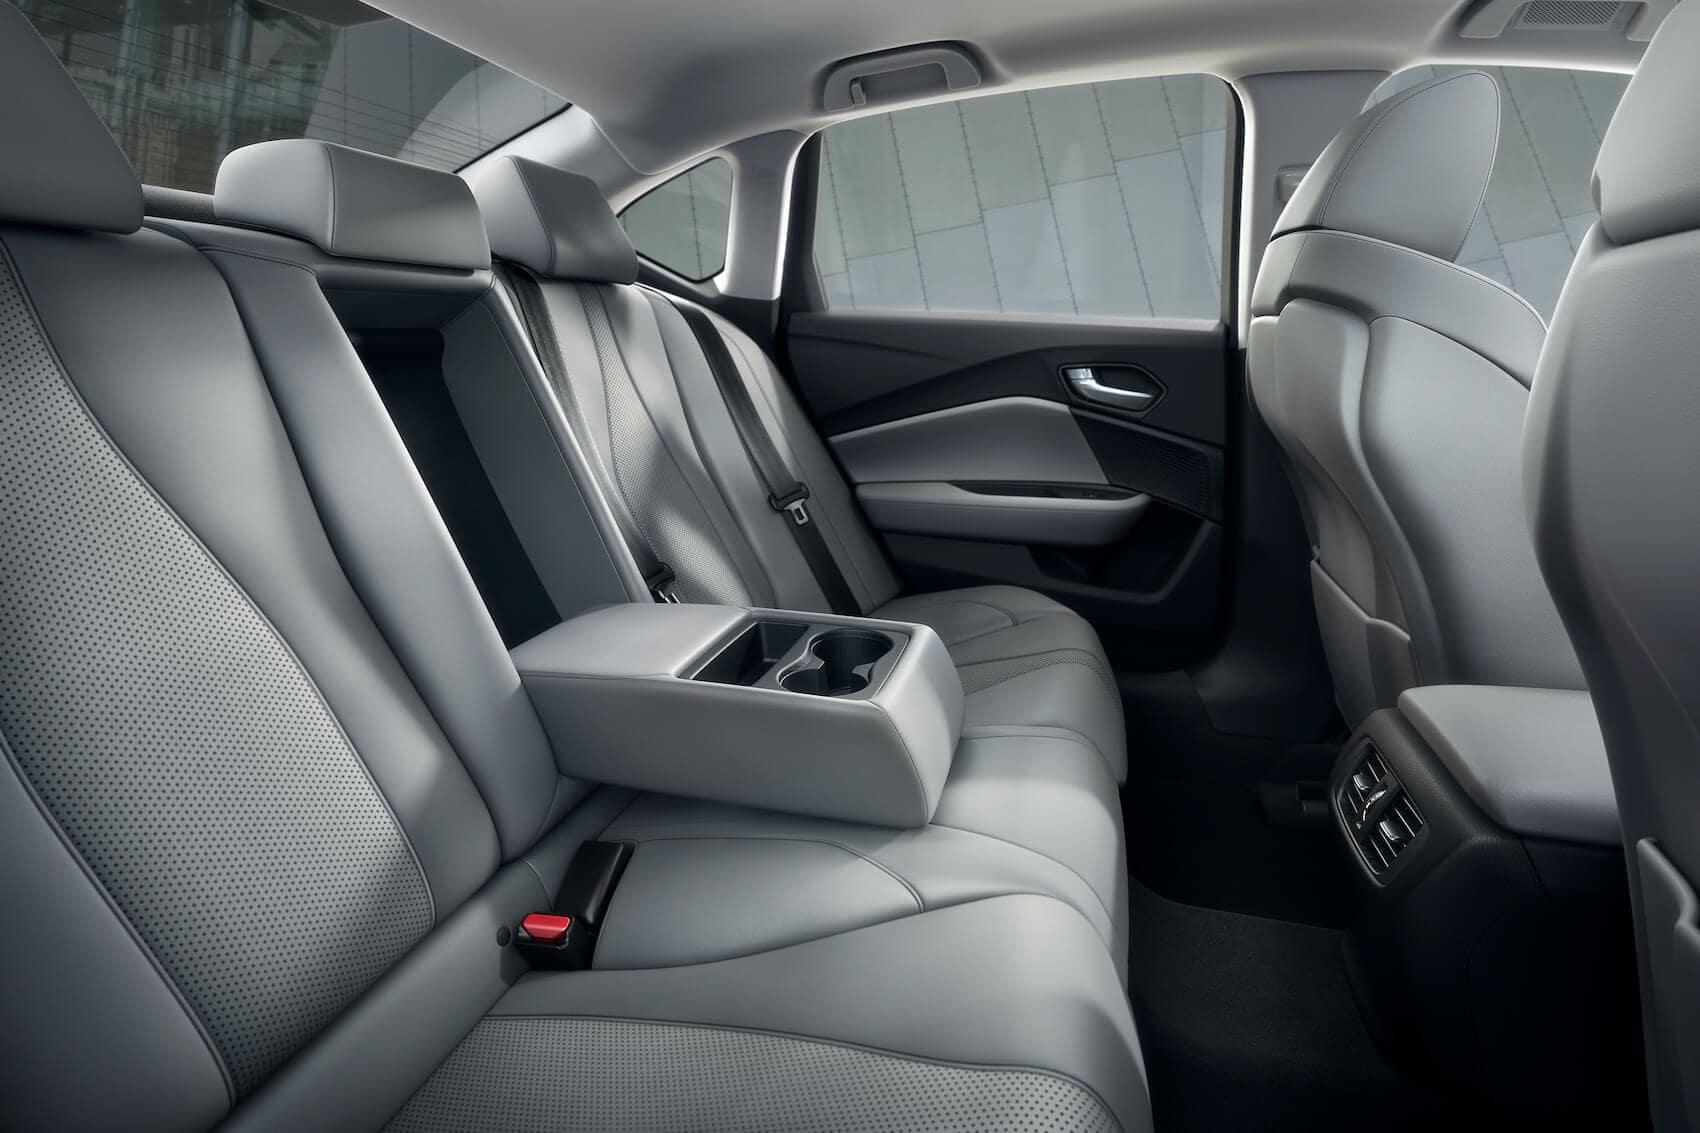 Acura TLX Interior Seating